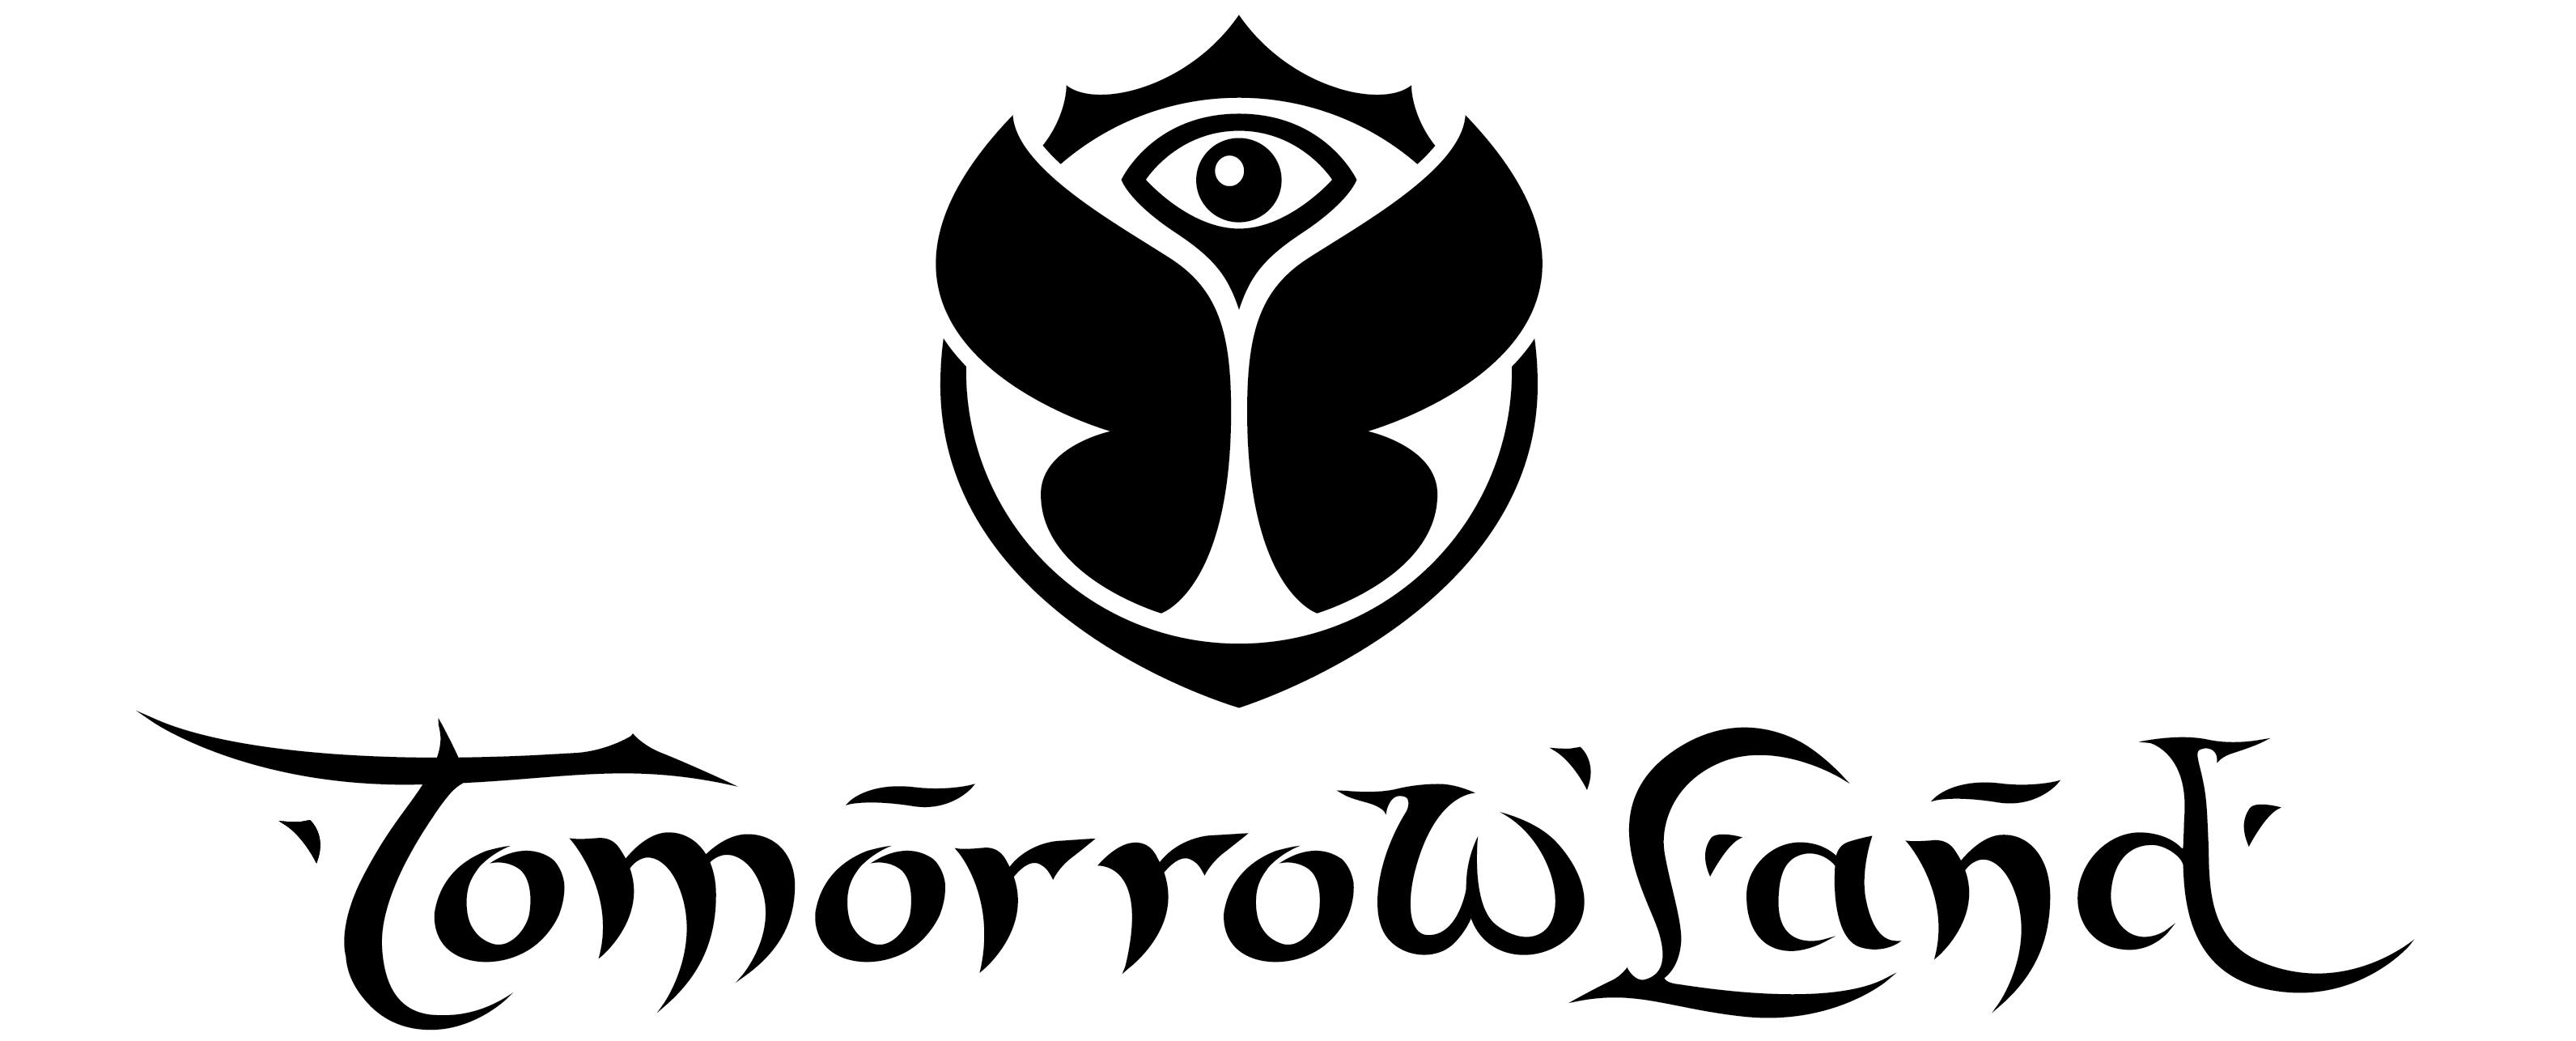 Logo klant van White Light: Tomorrowland